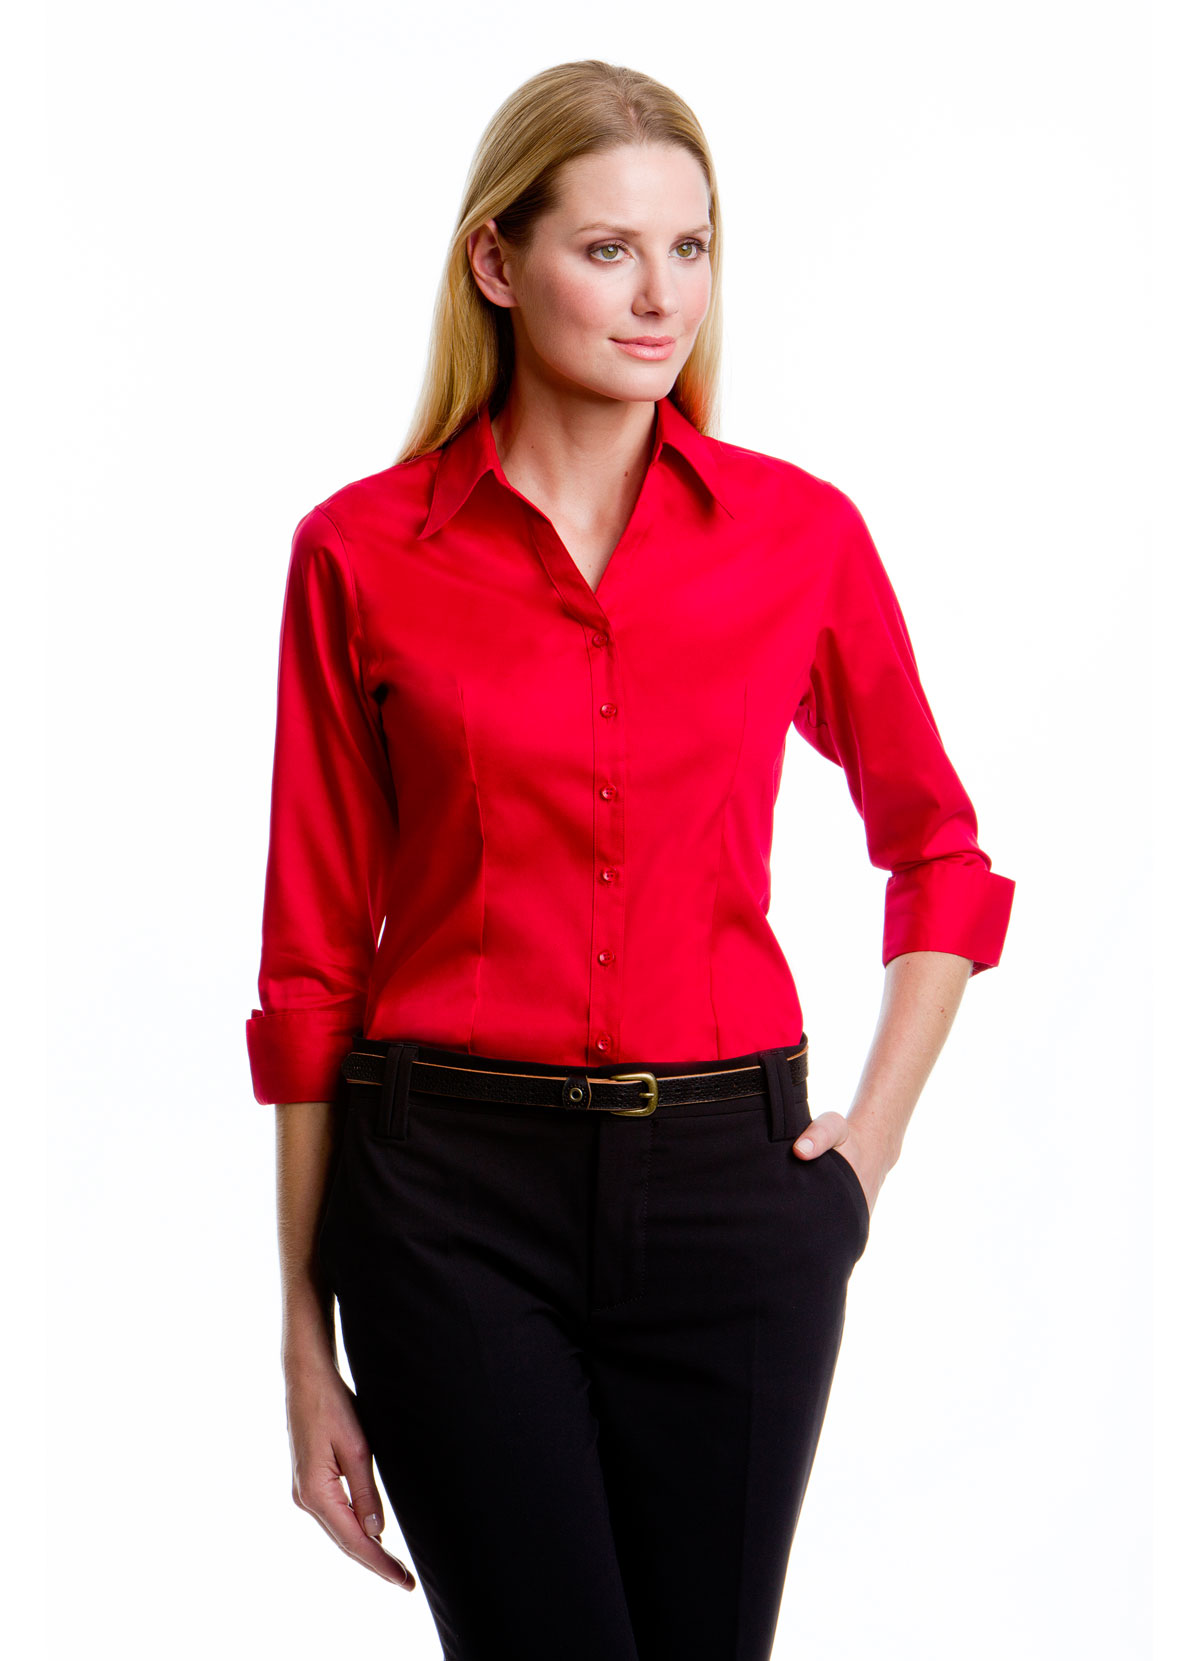 Kk710 Women 39 S Corporate Oxford Shirt 3 4 Sleeve G S Mahal